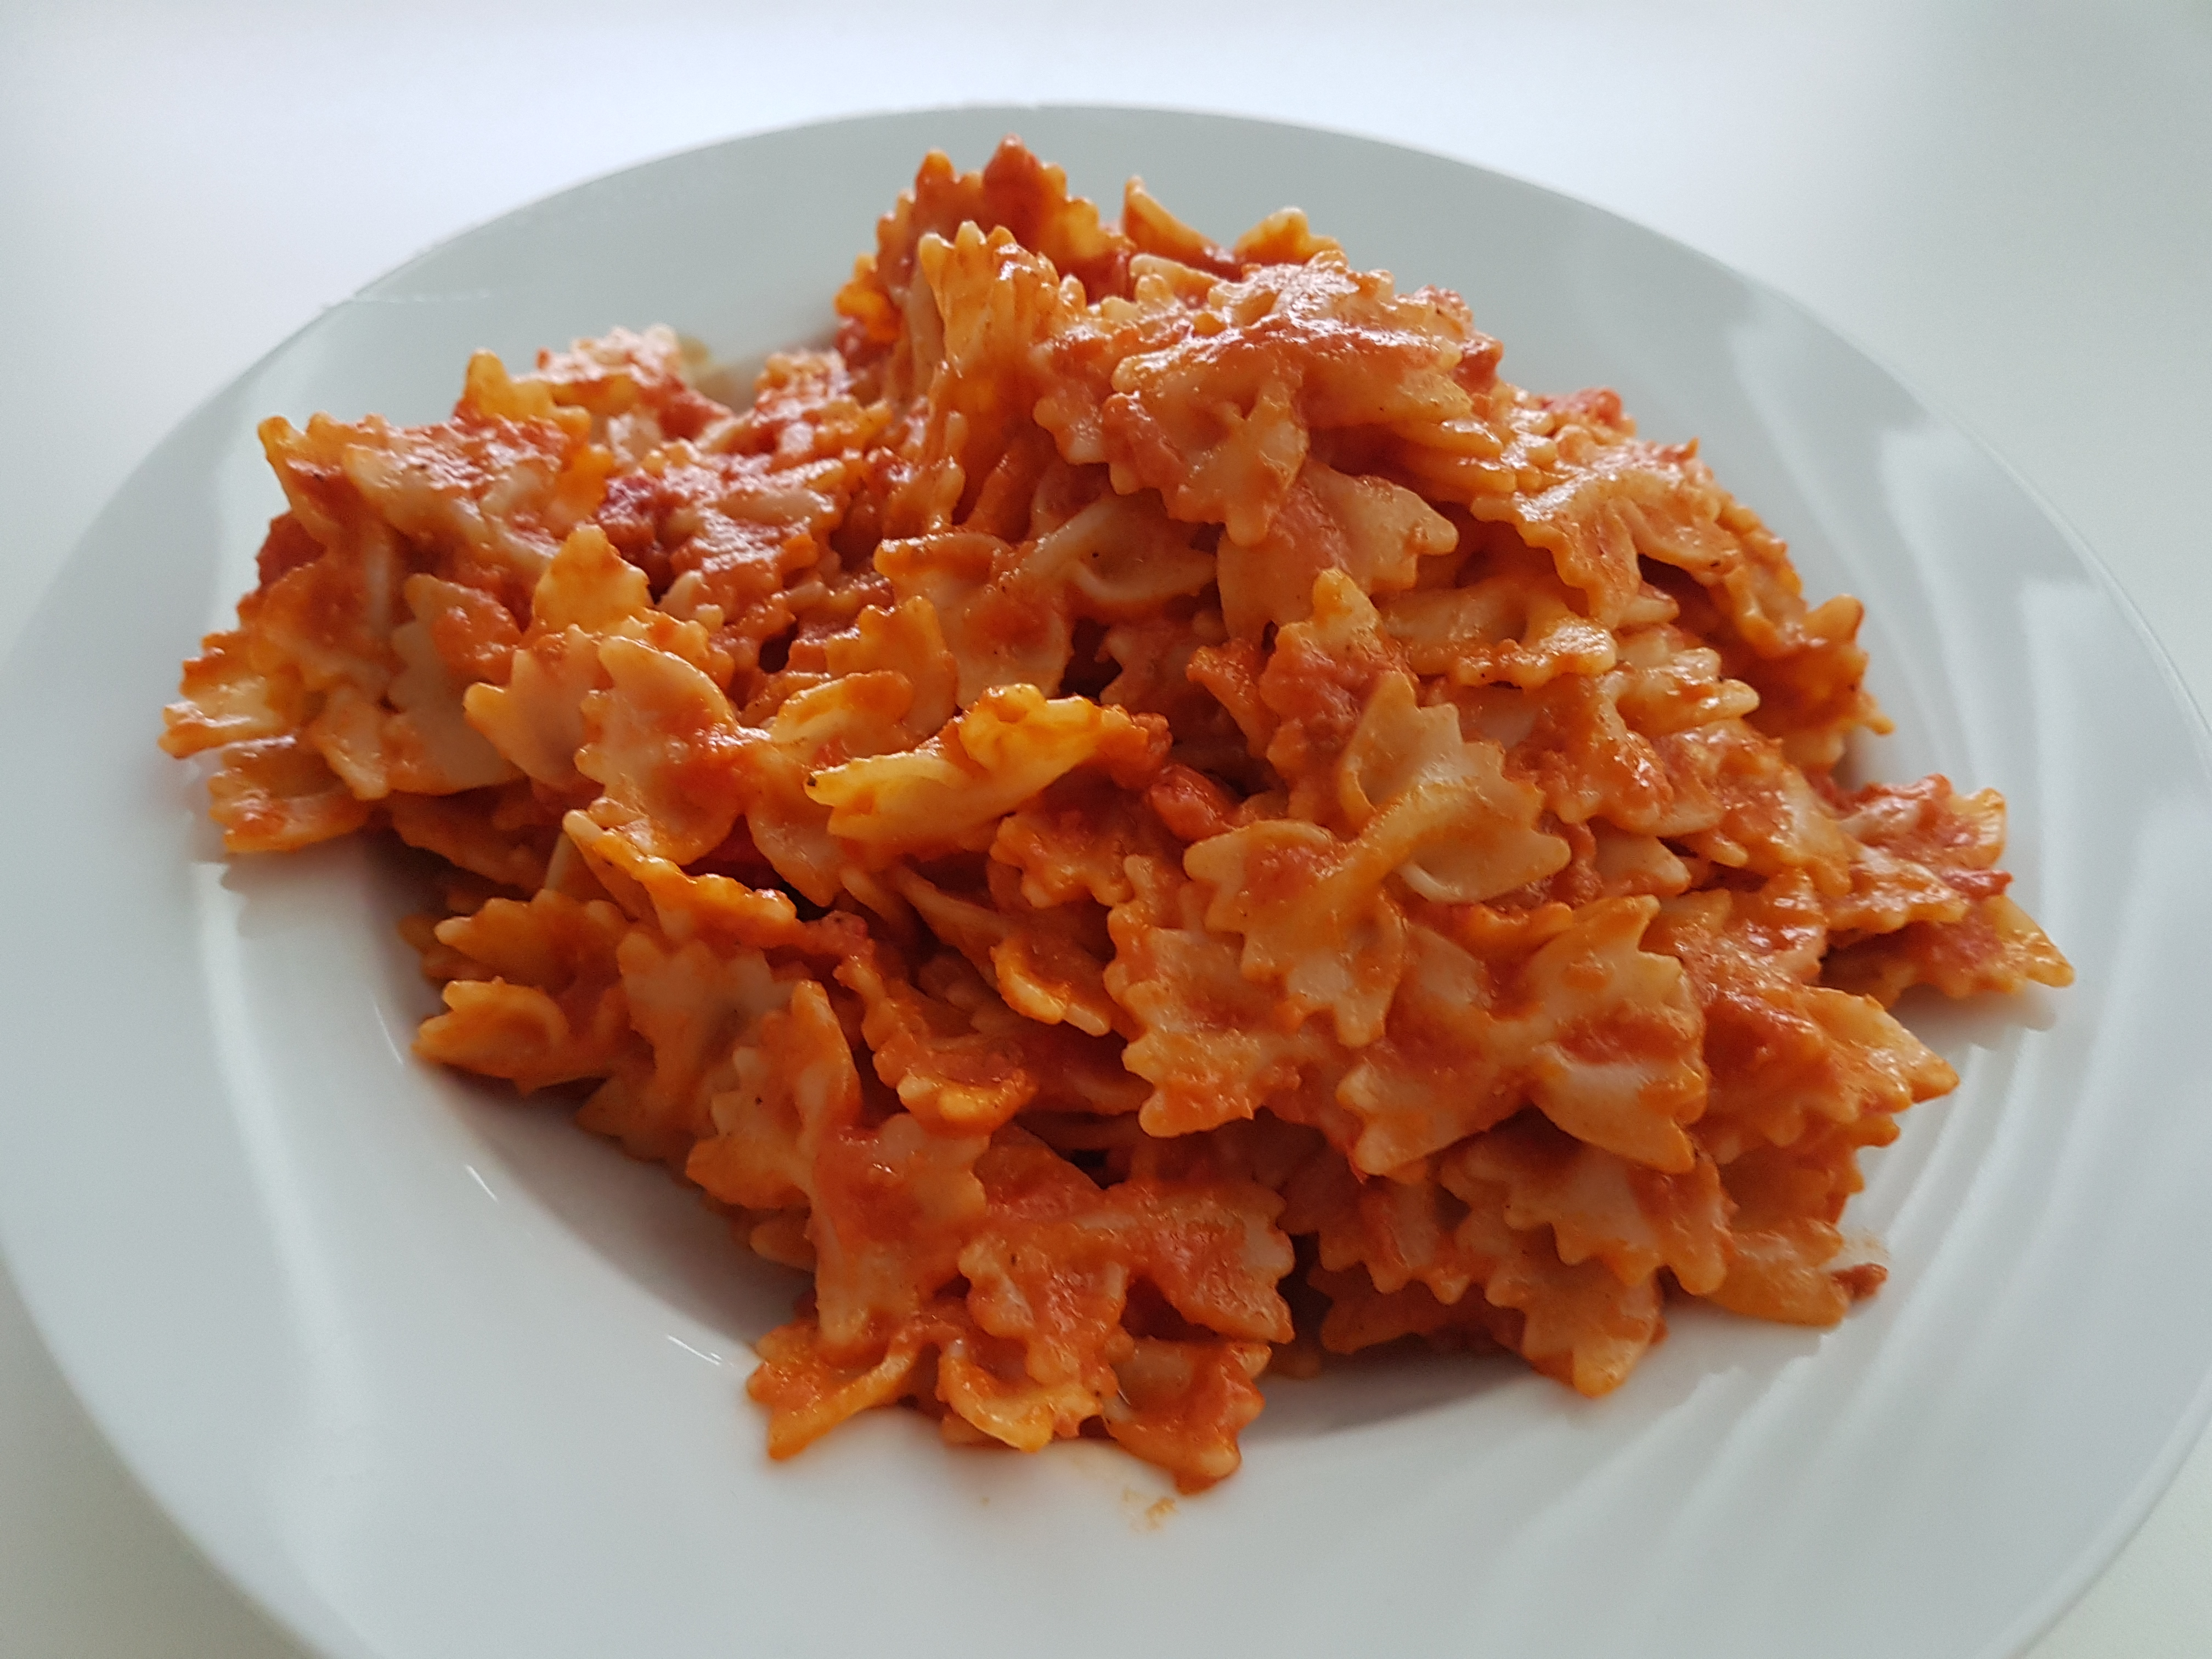 http://foodloader.net/Holz_2017-07-18_Farfalle_Rosso.jpg